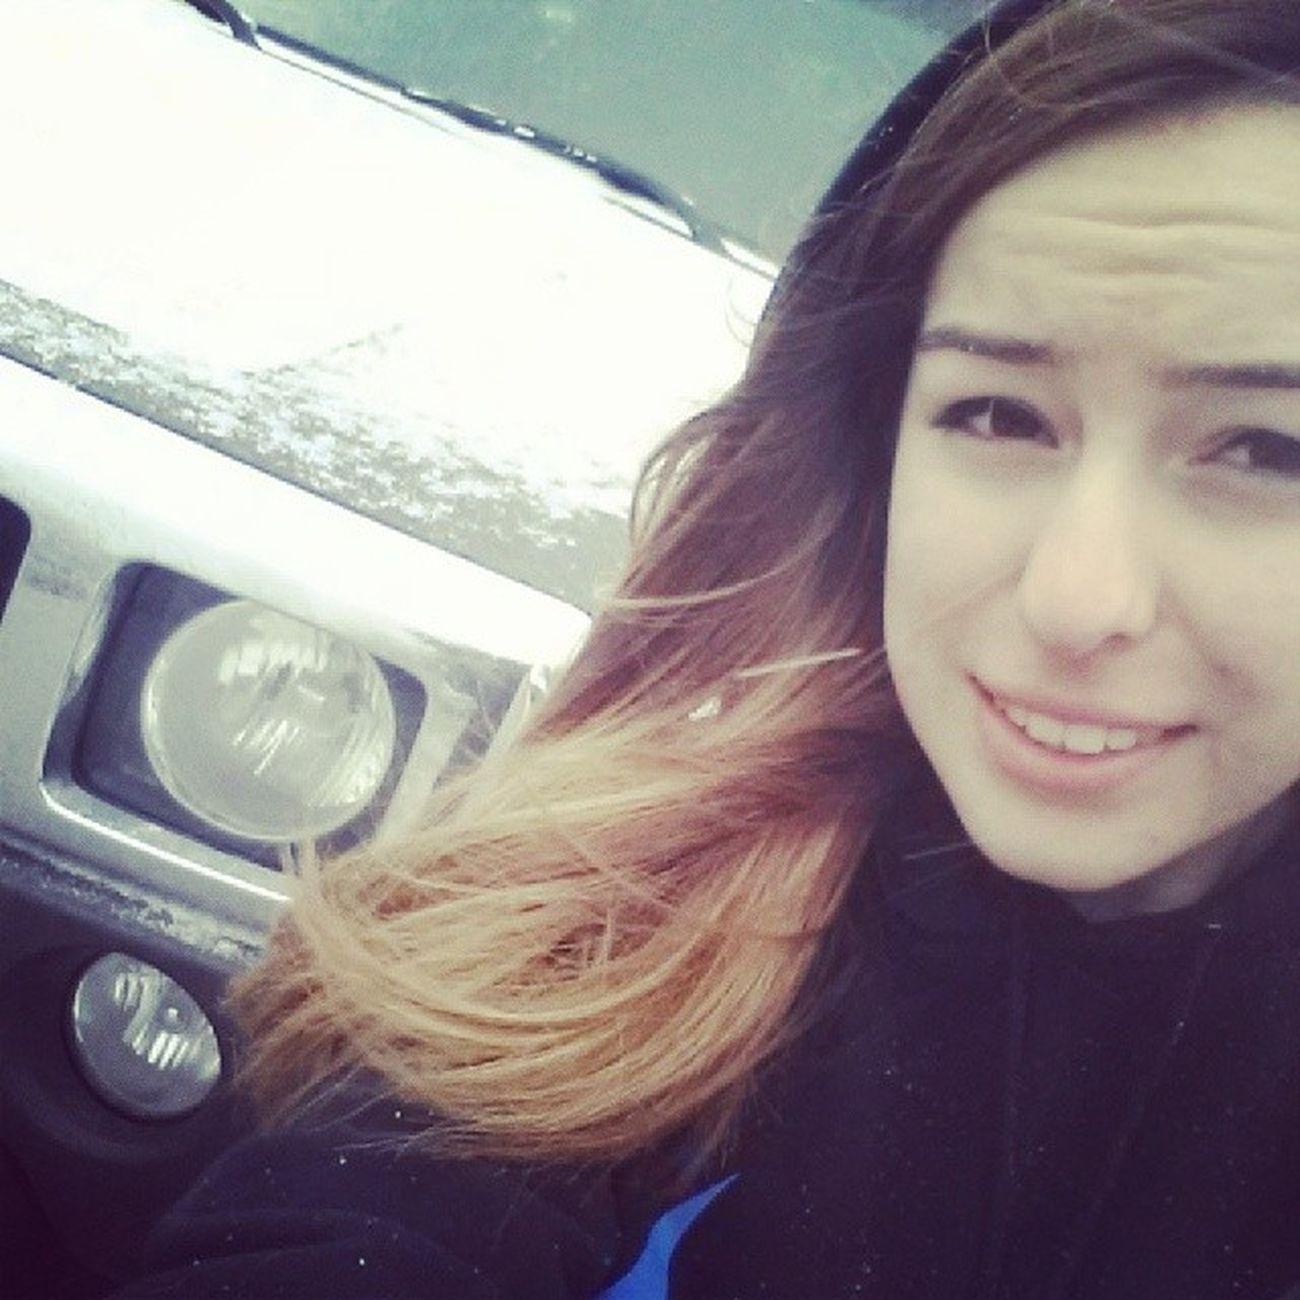 Snowed out! WrinklyForhead